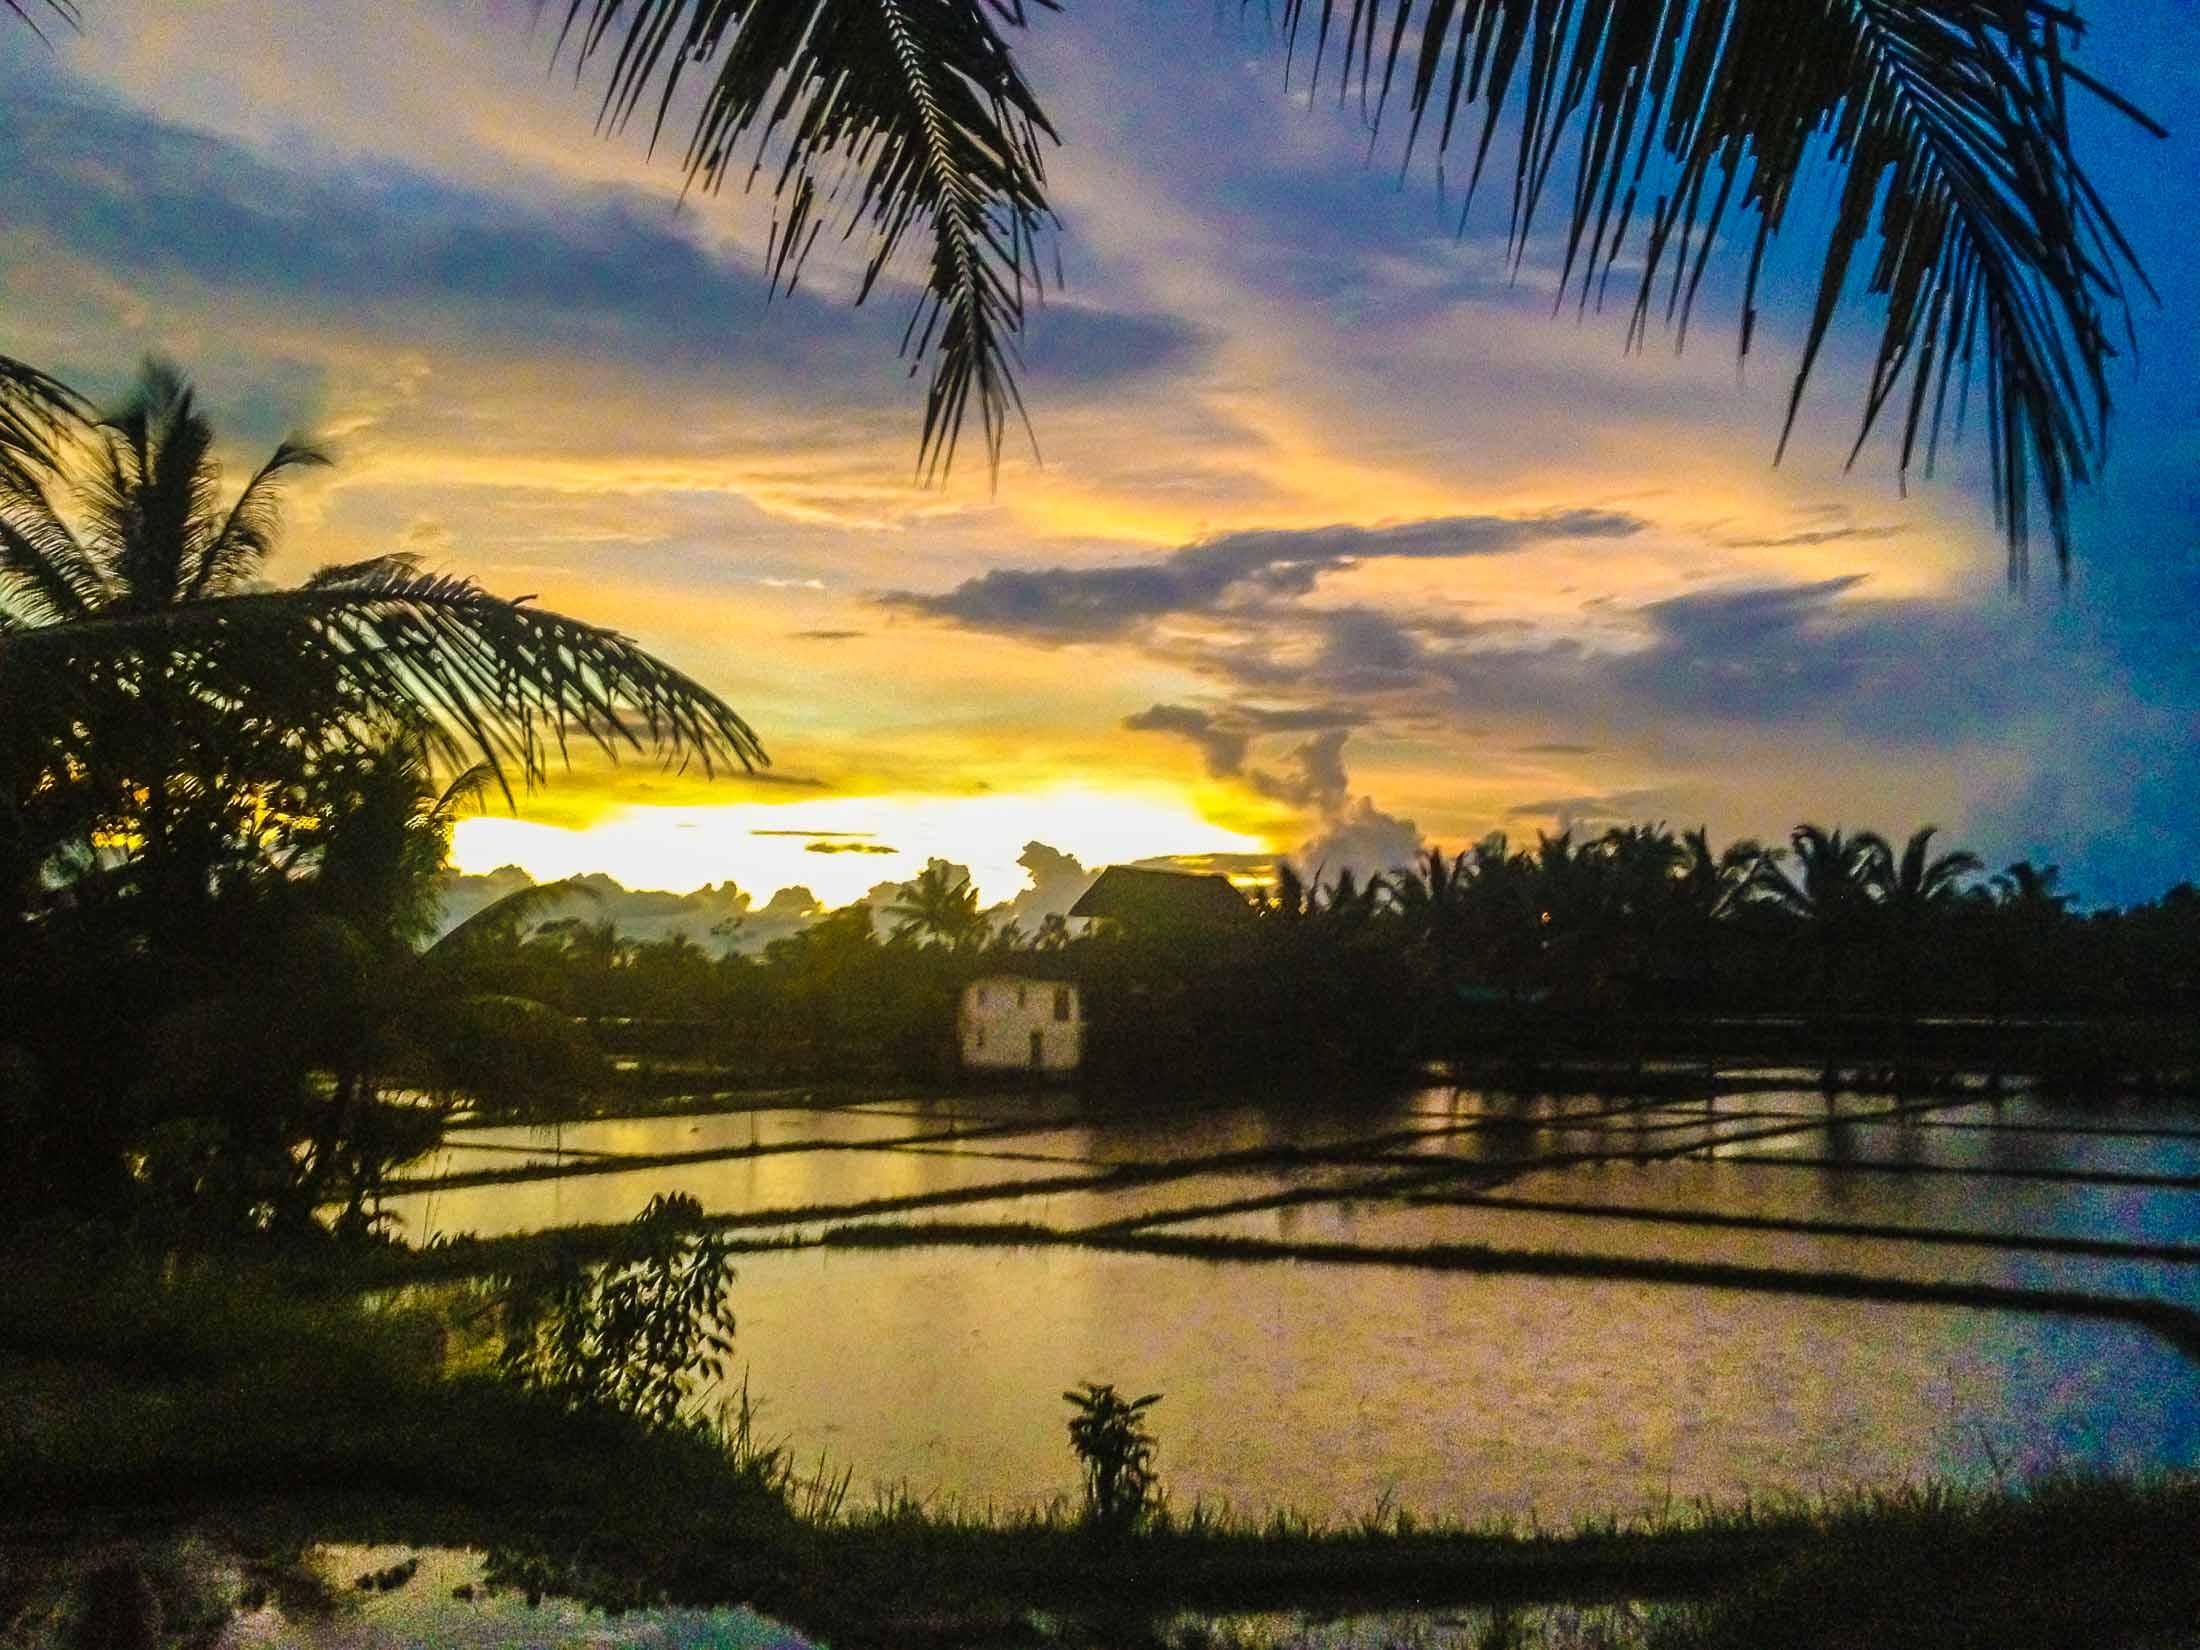 Subak rice terraces, Ubud, Bali